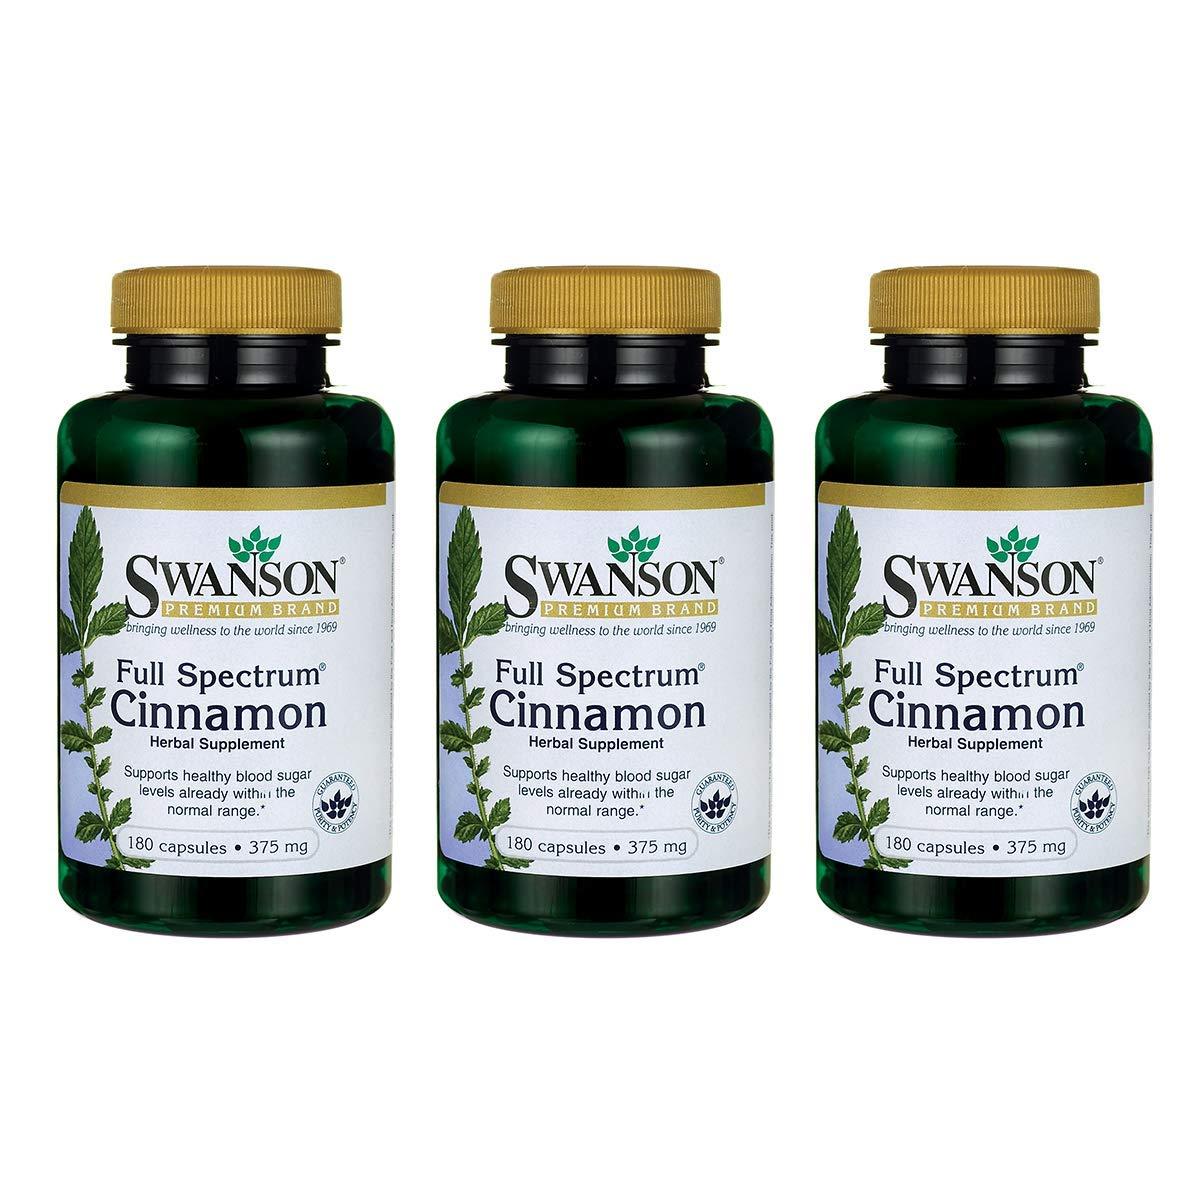 Swanson Cinnamon Cardiovascular Healthy Blood Sugar Glucose Levels Metabolic Support Cinnamomum Cassia (bark) Herbal Supplement 375 mg (700 mg per 2 Capsule Serving) 180 Capsules (Caps) (3 Pack)